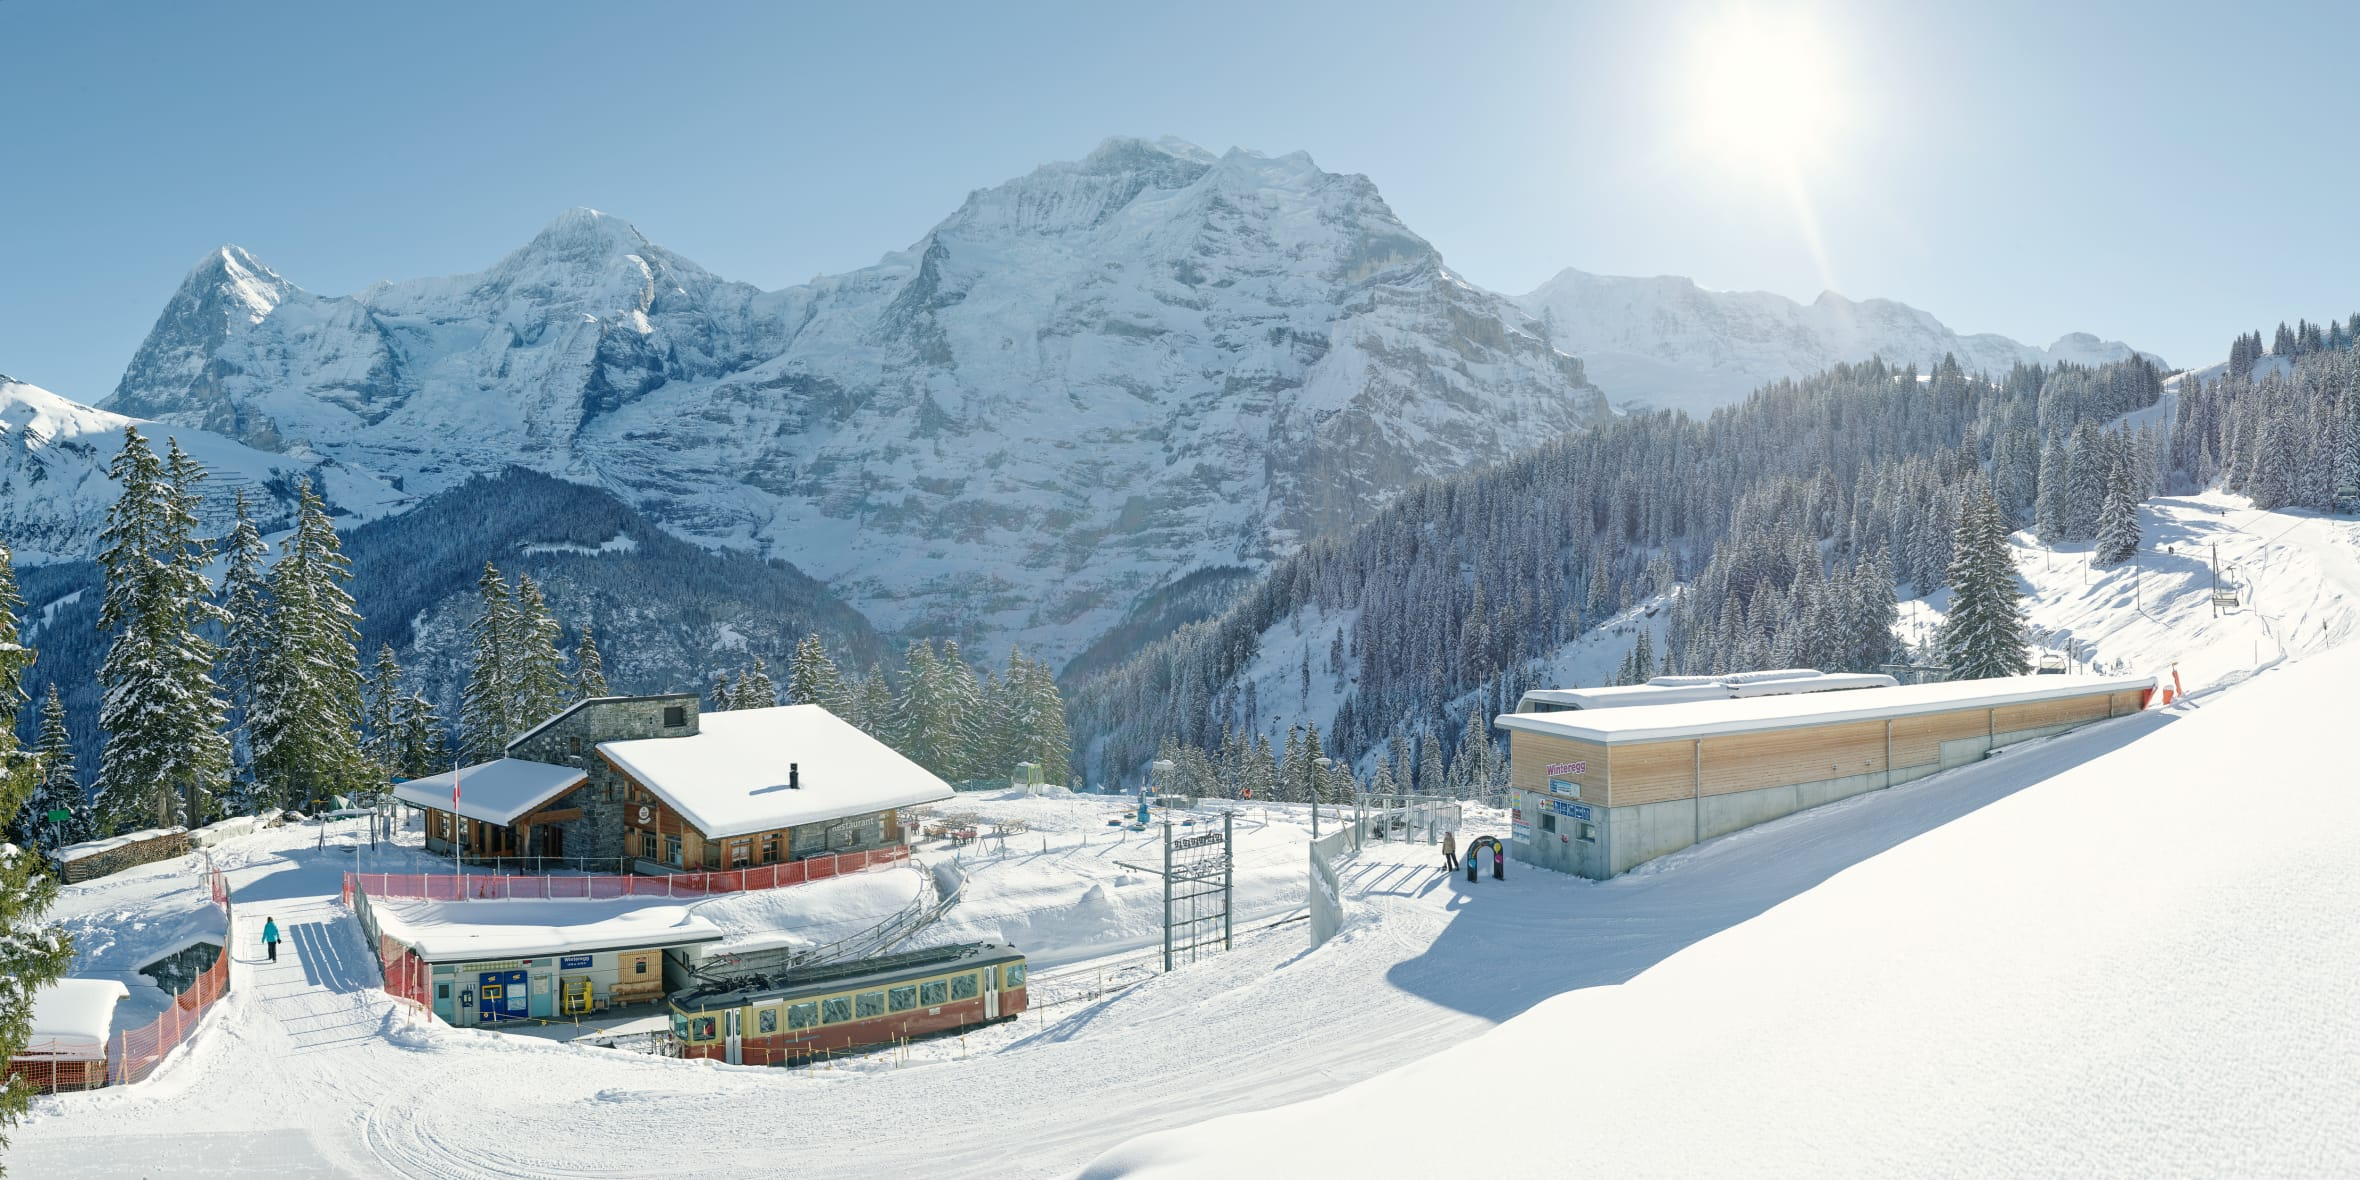 Bahnen-Maschinen, Bergbahn-Lauterbrunnen-Muerren, Jungfrau-Ski-Region, Neuschnee, Winter, Winteregg-Muerren, jungfrau.ch